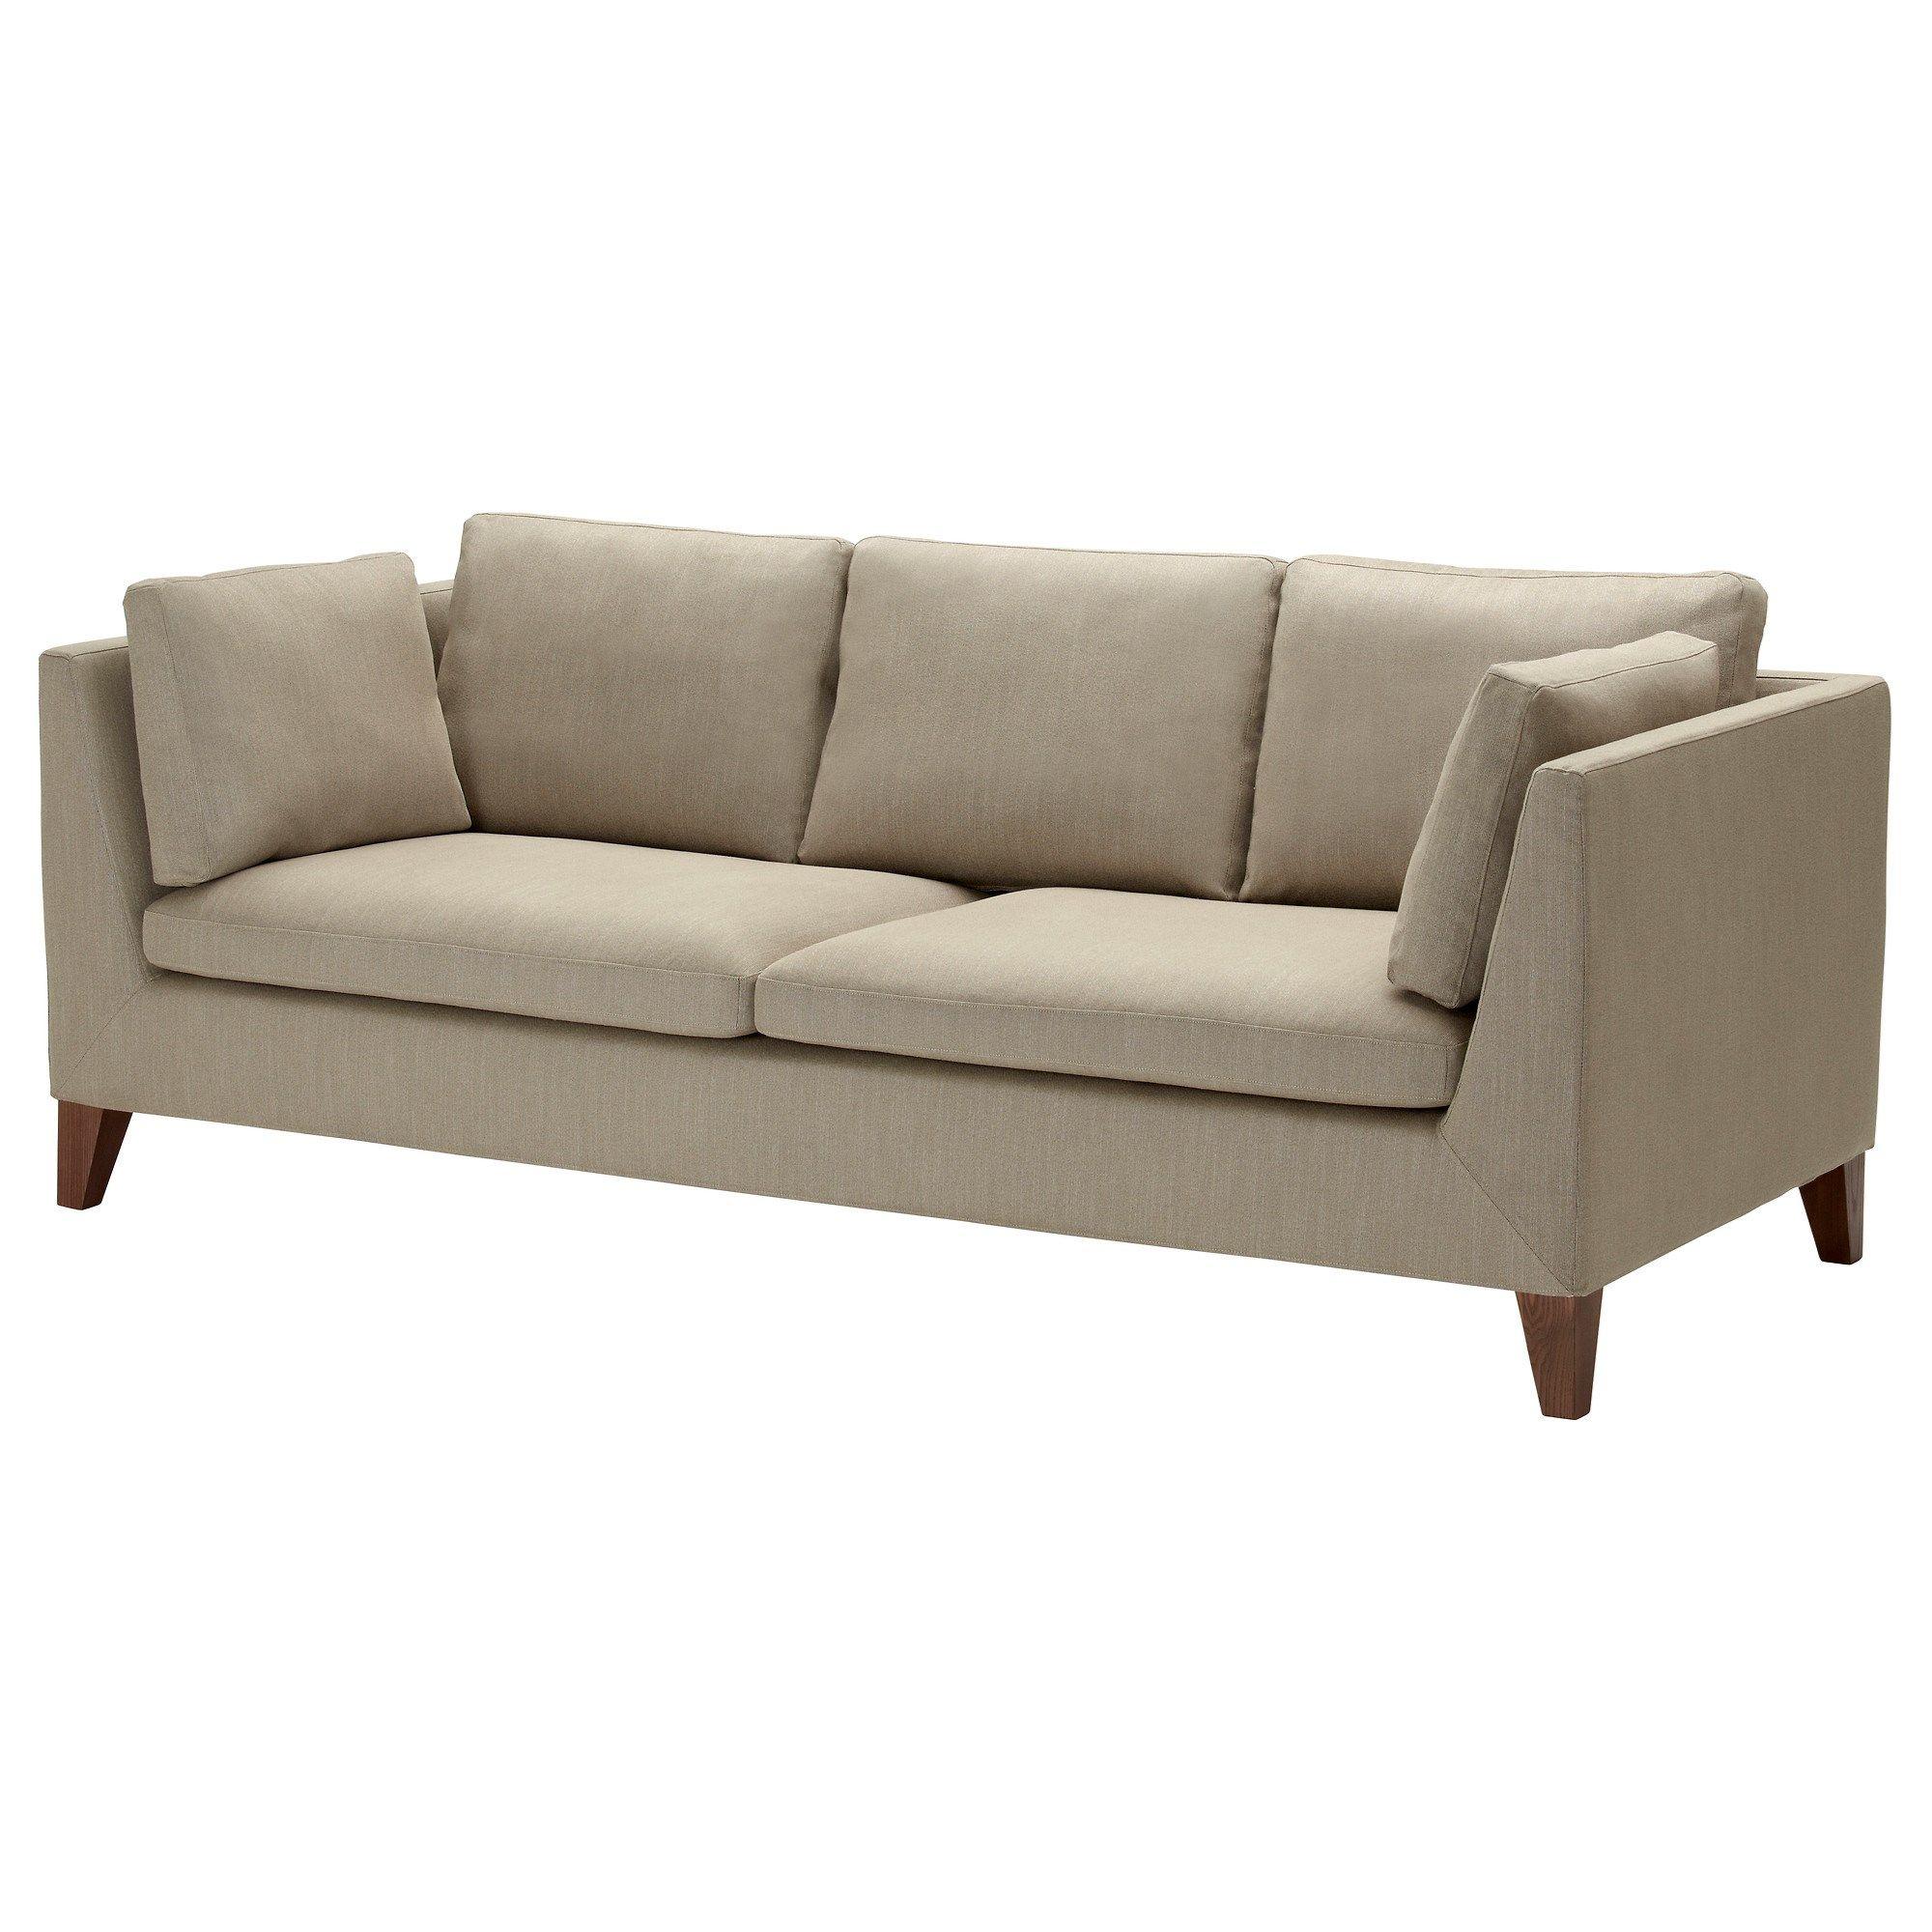 Stockholm 3'lü Kanepe Gammelbo Açık Kahverengi | Ikea Oturma Odaları In Ikea Sofa Chairs (View 15 of 25)